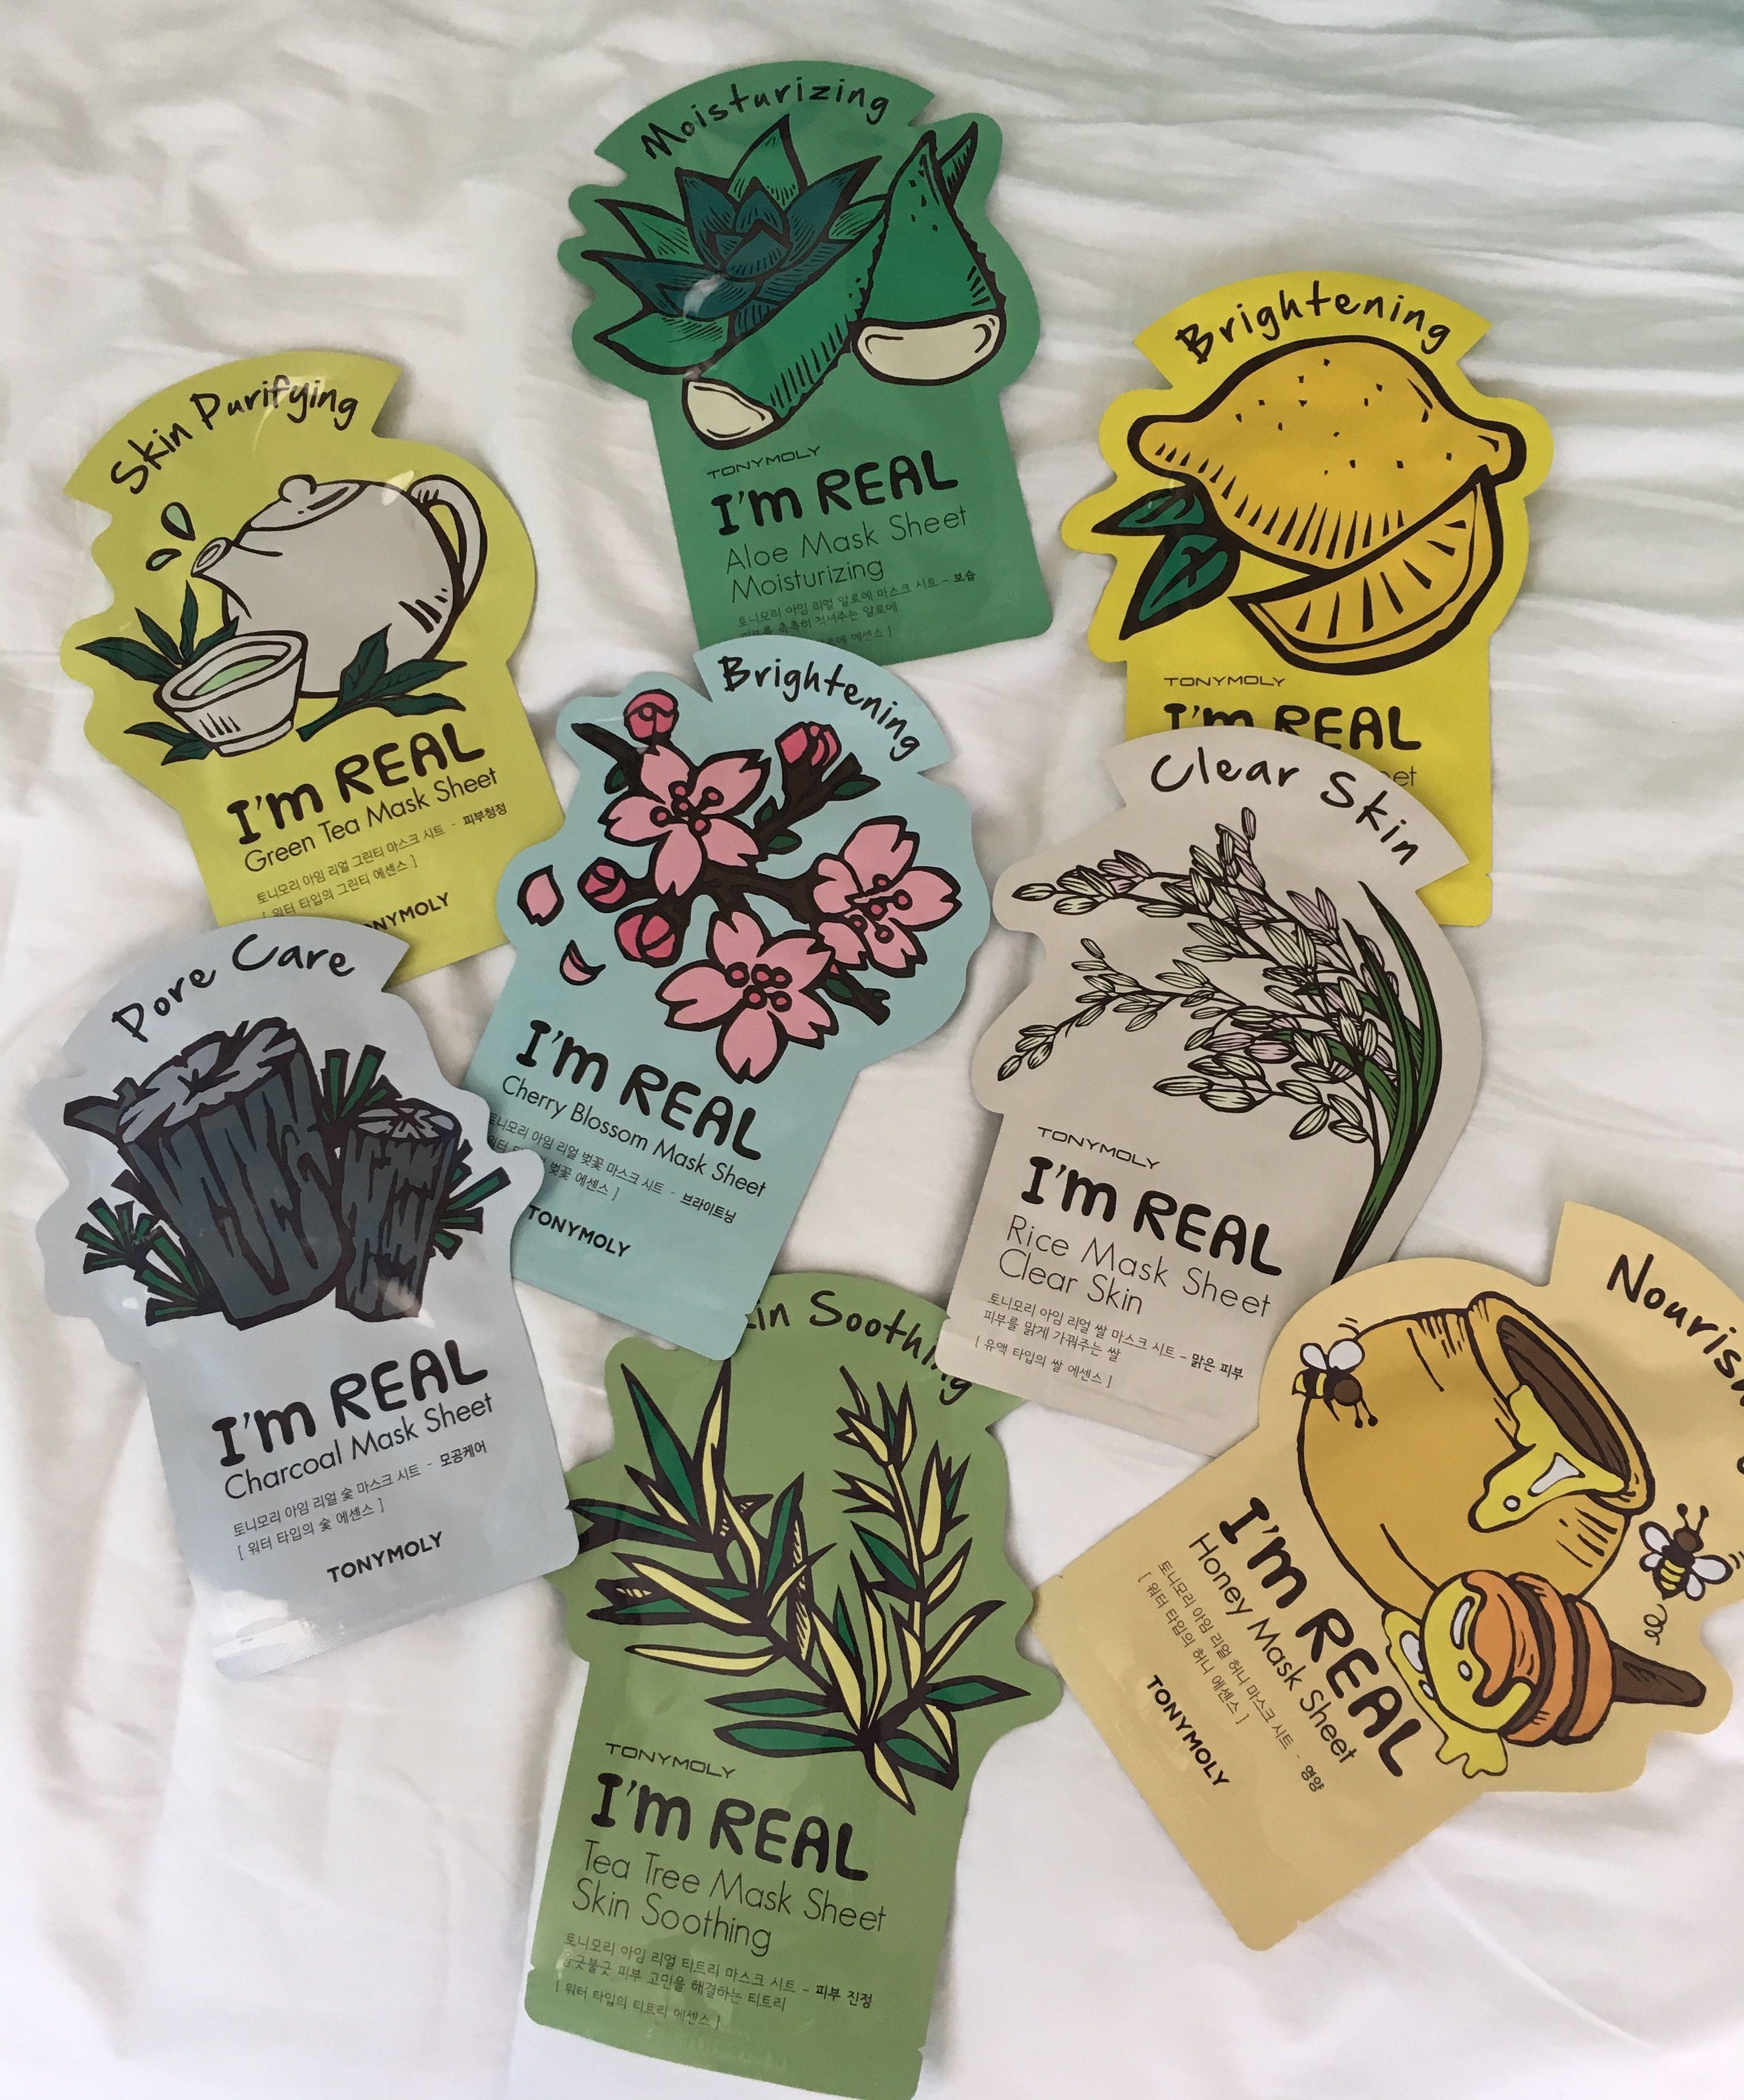 Photo of Sheet masks from TONYMOLY  #SkinTighteningAfterWeightLoss #…